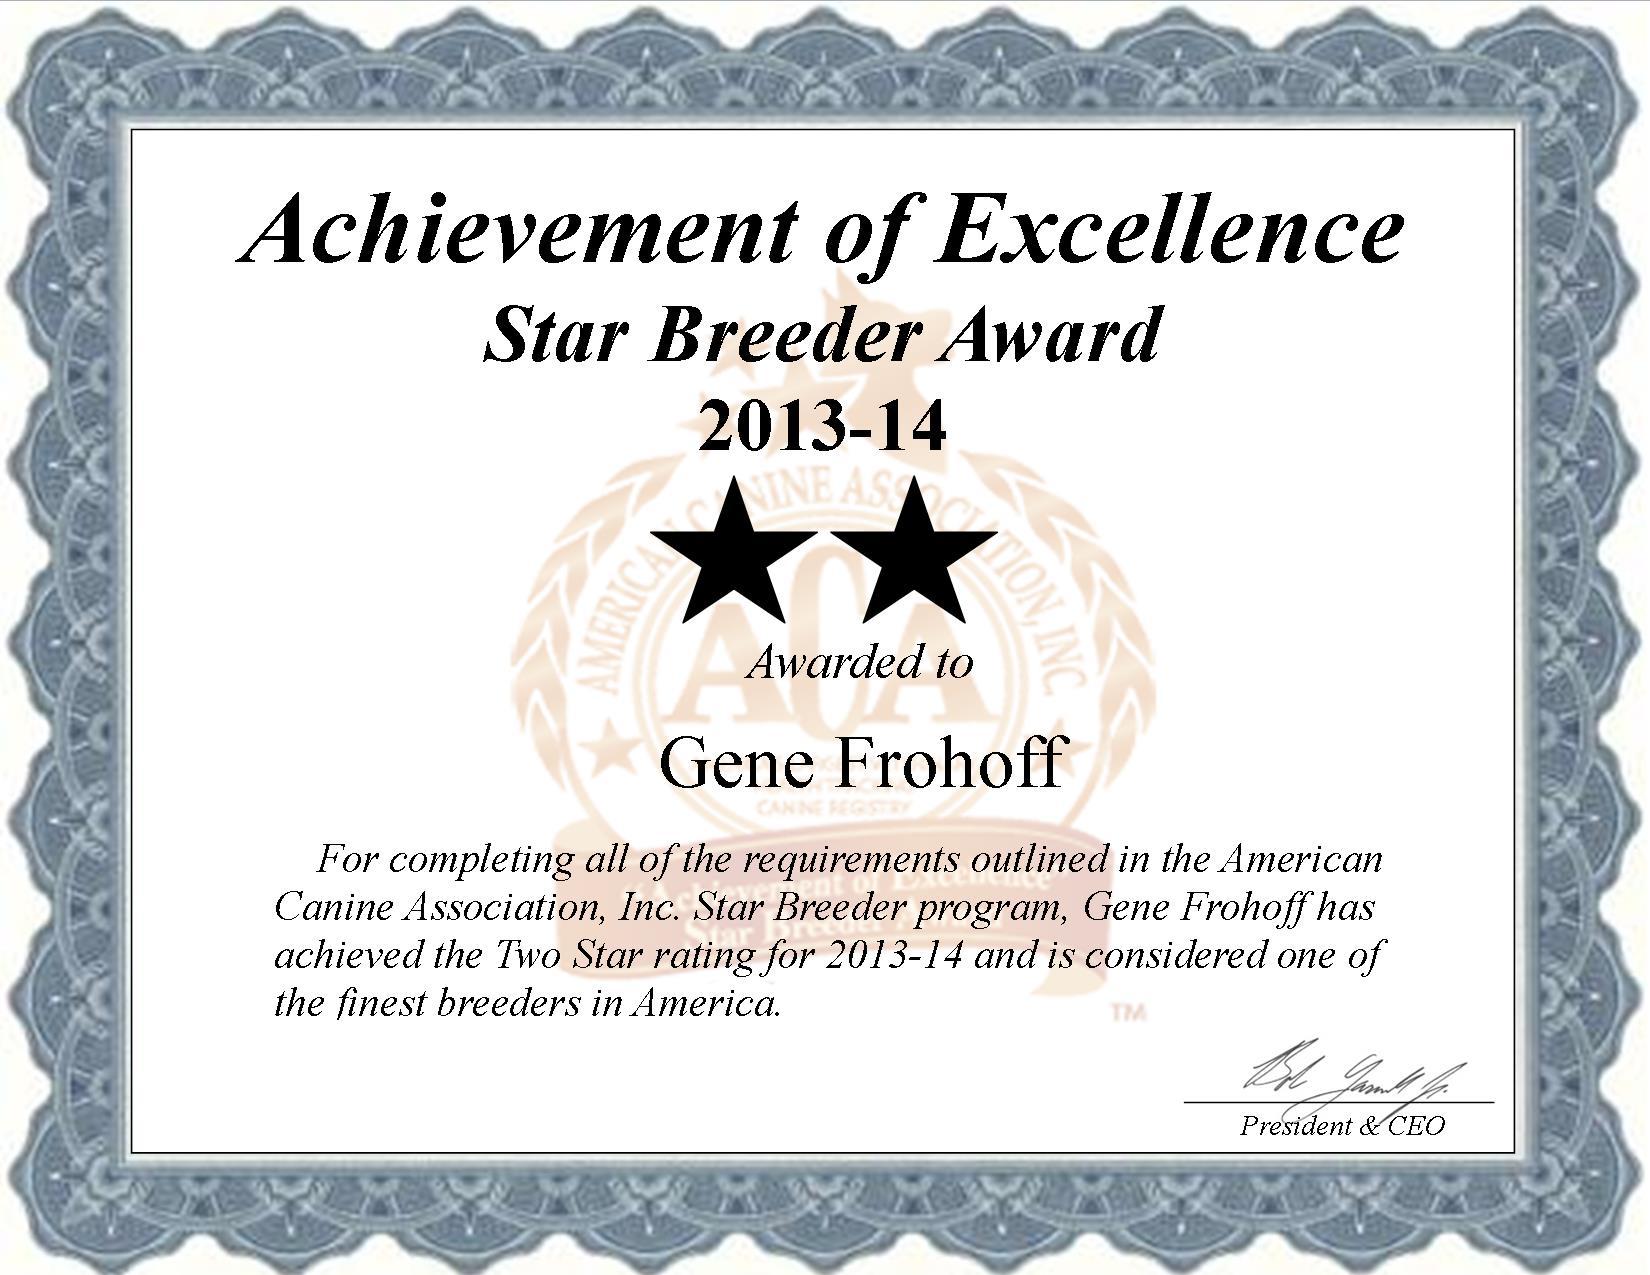 Gene Frohoff, Gene, Frohoff, Frohoff, Gene Frohoff breeder, Gene Frohoff dog breeder, star breeder, aca, star breeder, 2 star, Missouri, MO, dog, puppy, puppies, dog breeder, dog breeders, Missouri breeder, Gene Frohoff dog breeder